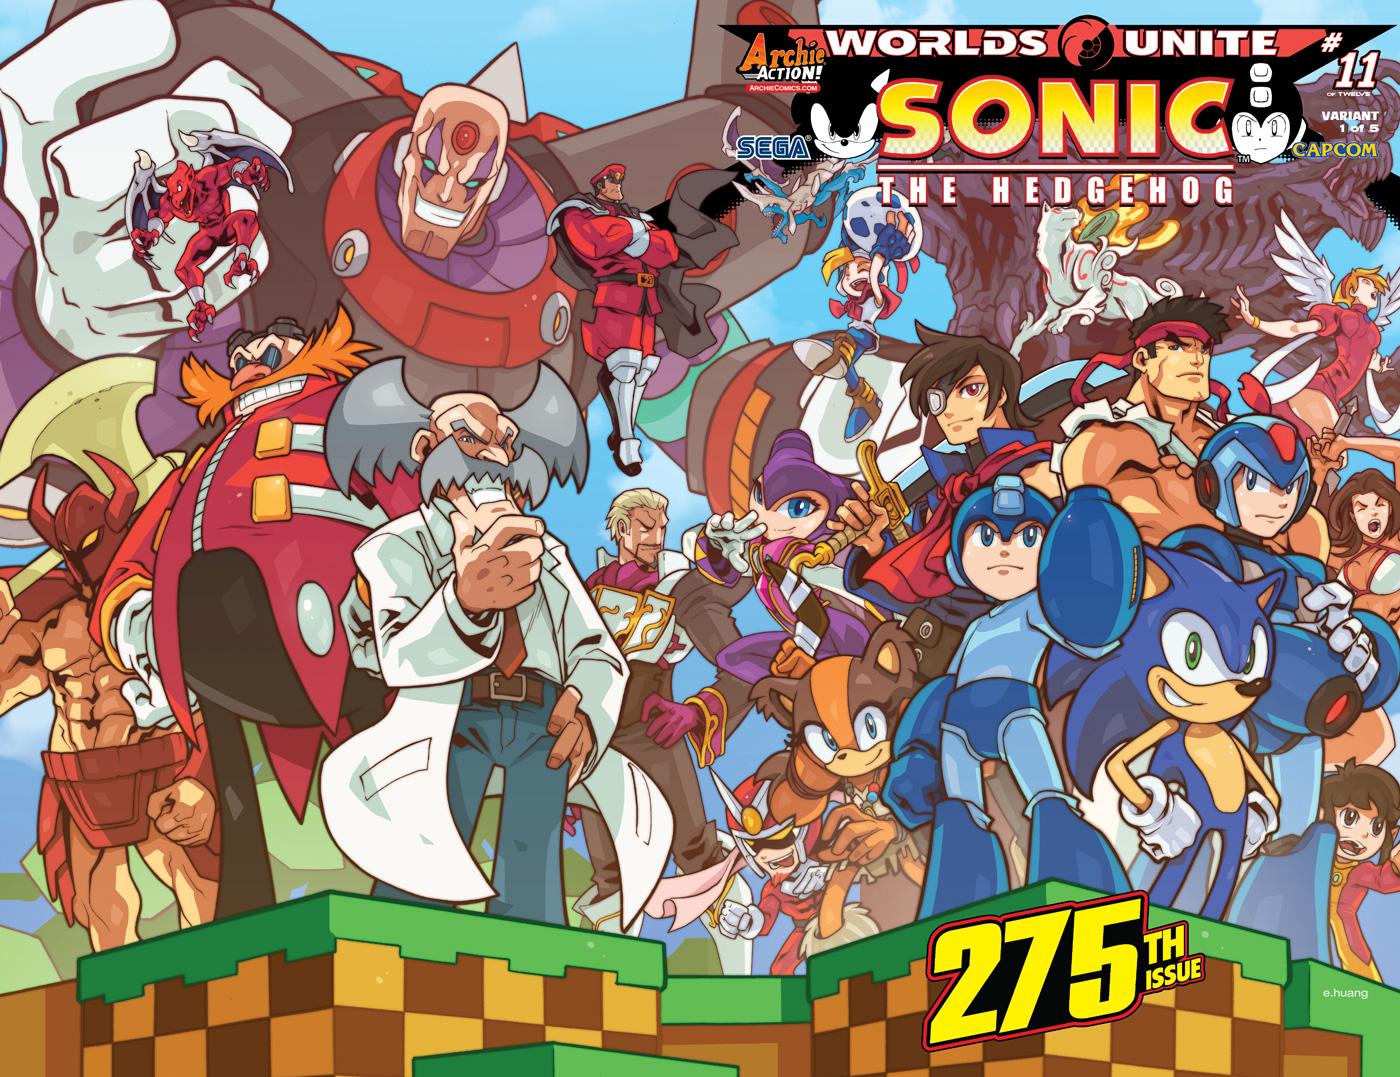 Sonic_275-0VB.jpg